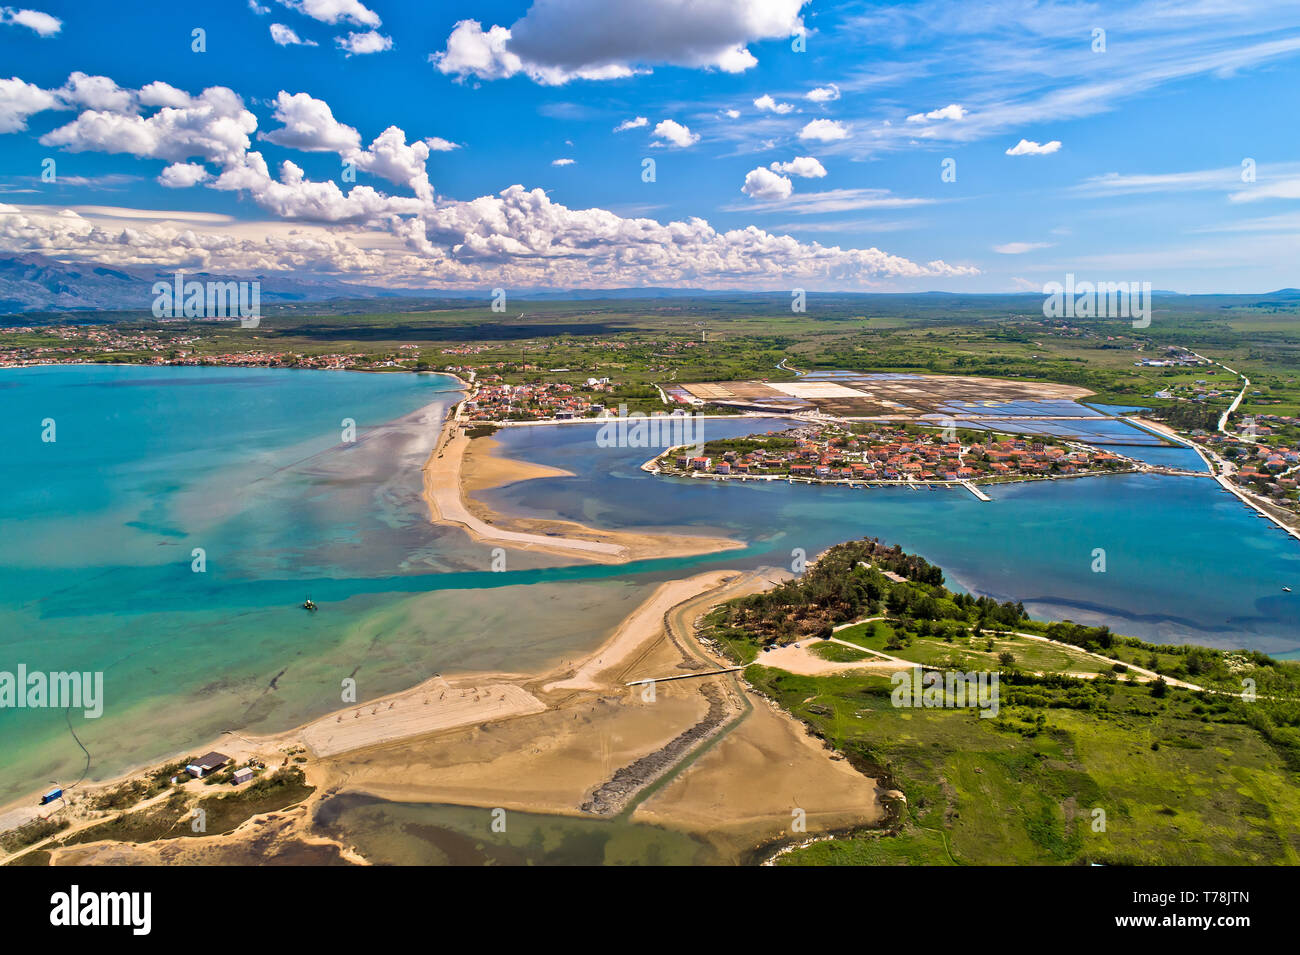 Historic town of Nin laguna and beach sandbars aerial view, Ravni Kotari background, Dalmatia region of Croatia Stock Photo